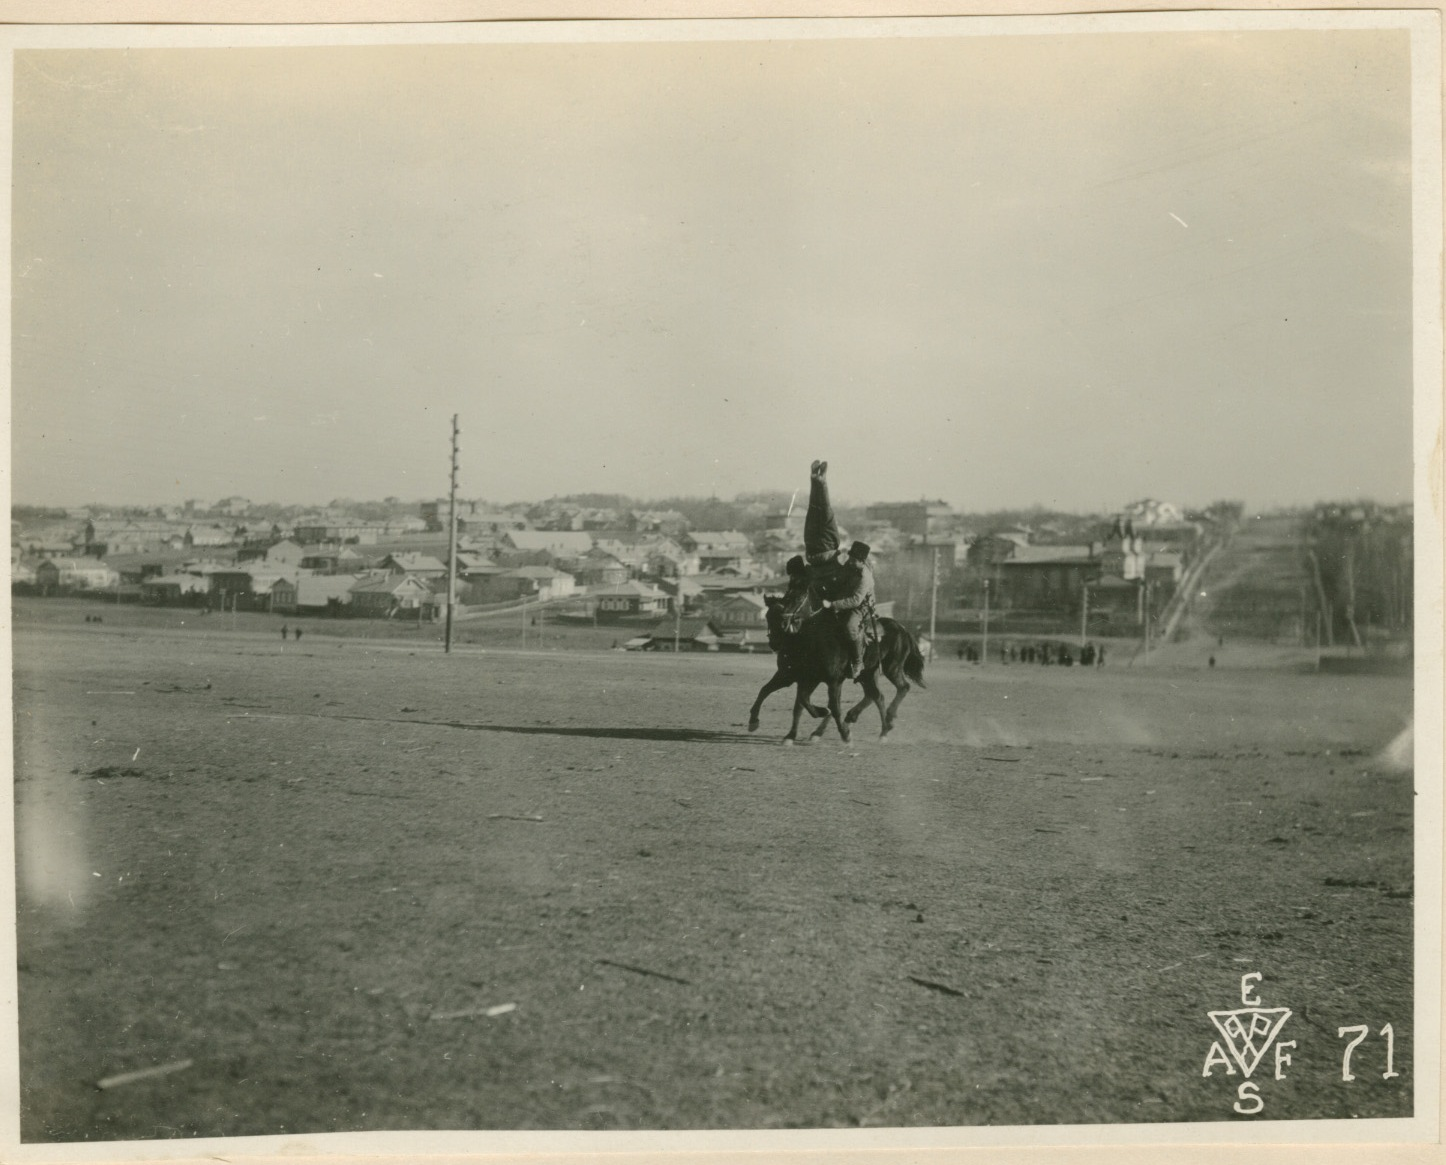 191811aefs71